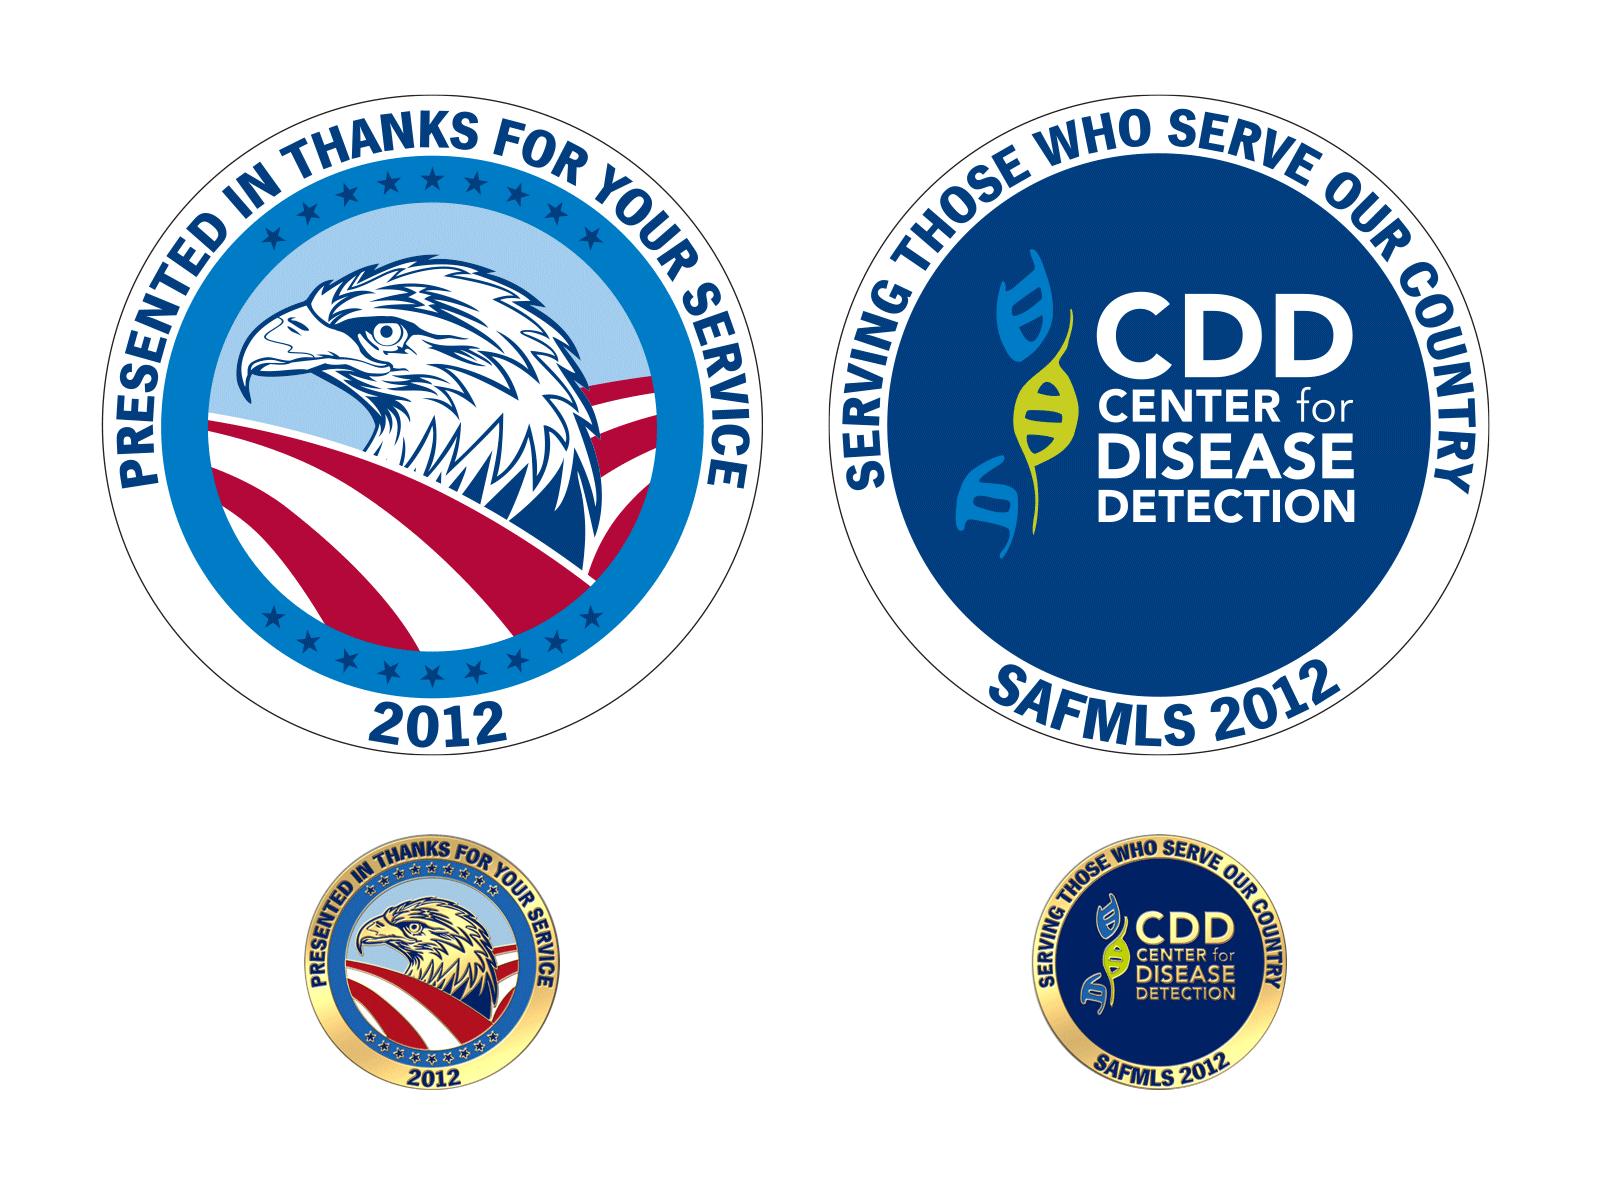 Center for Disease Detection : Coin